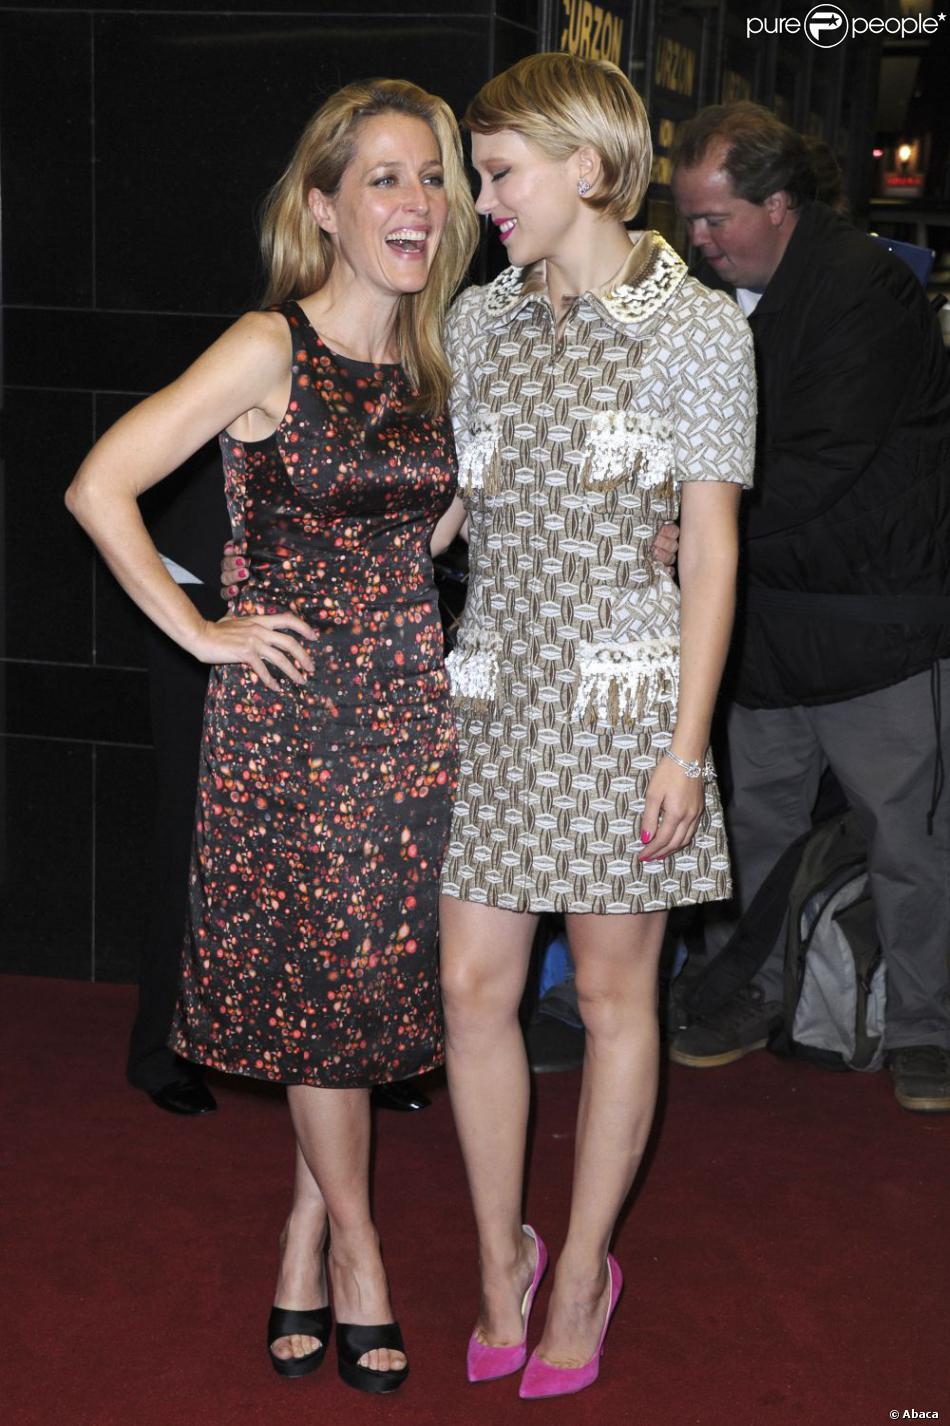 Anderson Gillian Nue gillian anderson de x-files et léa seydoux : un duo aux